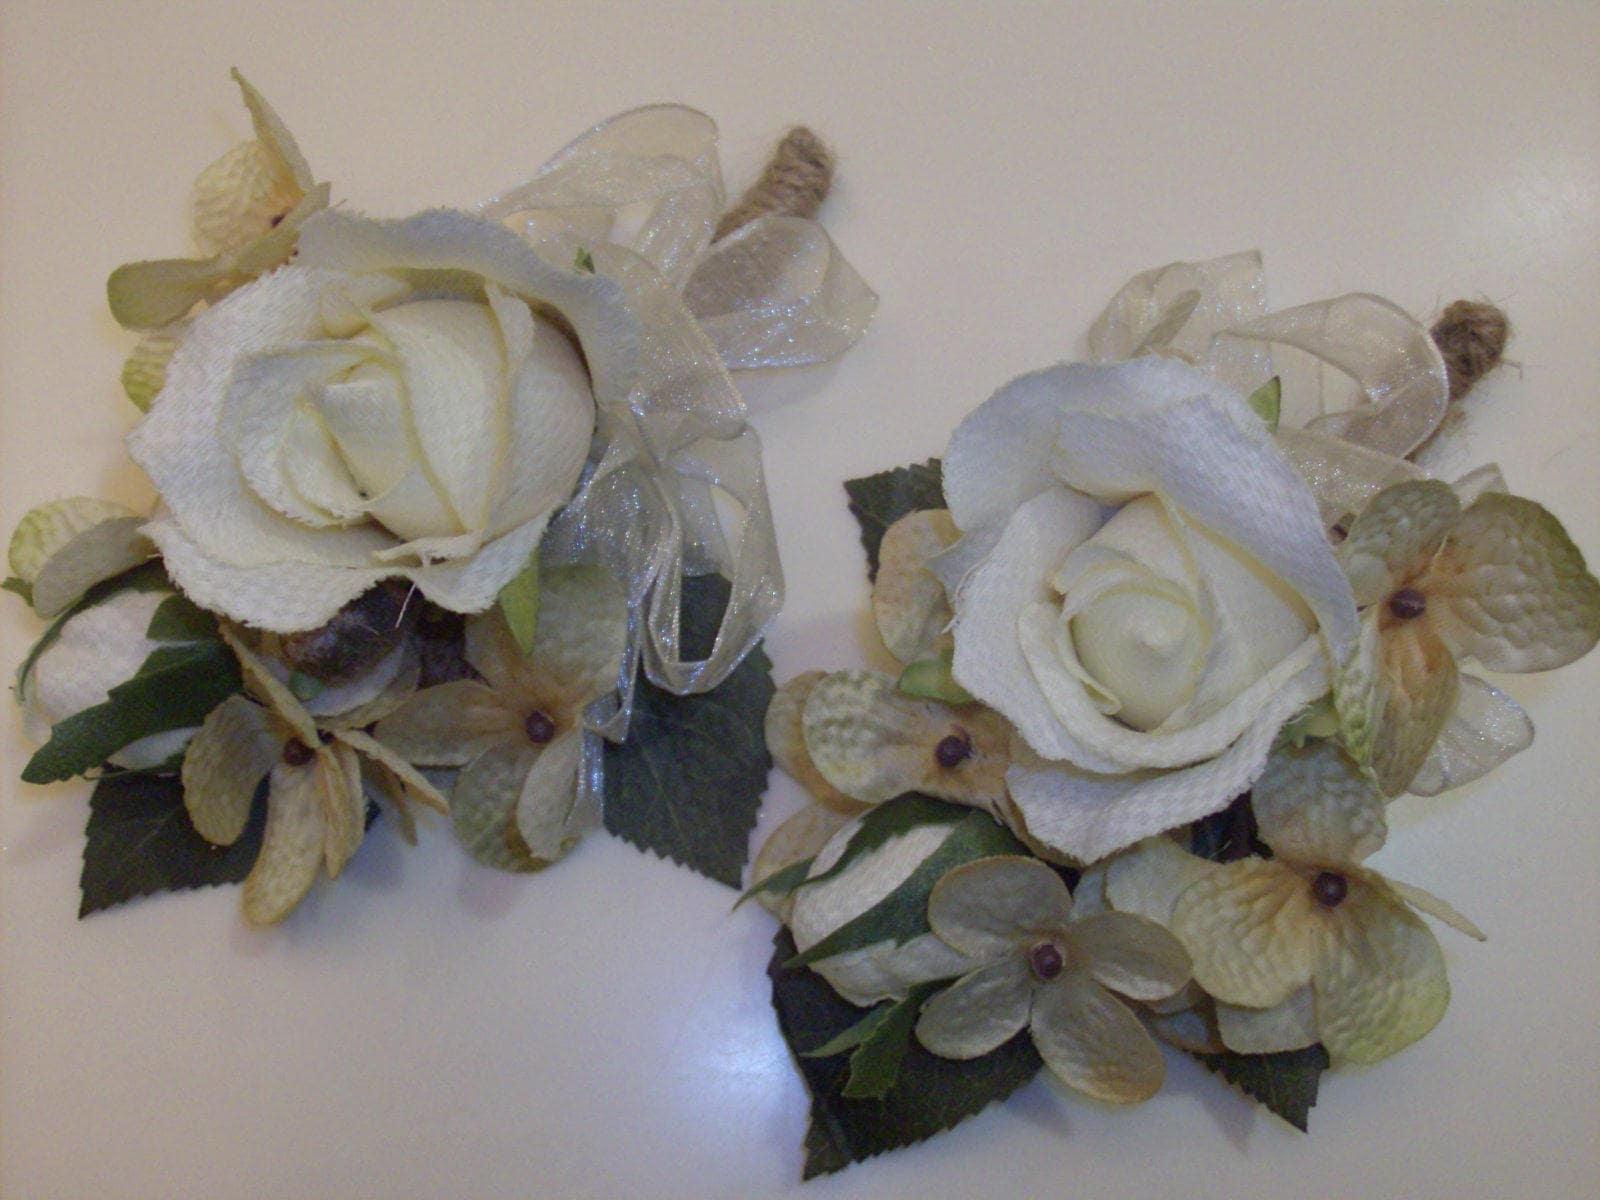 2 Pc Set Rustic Wedding Burlap Rose Corsages Silk Flowers